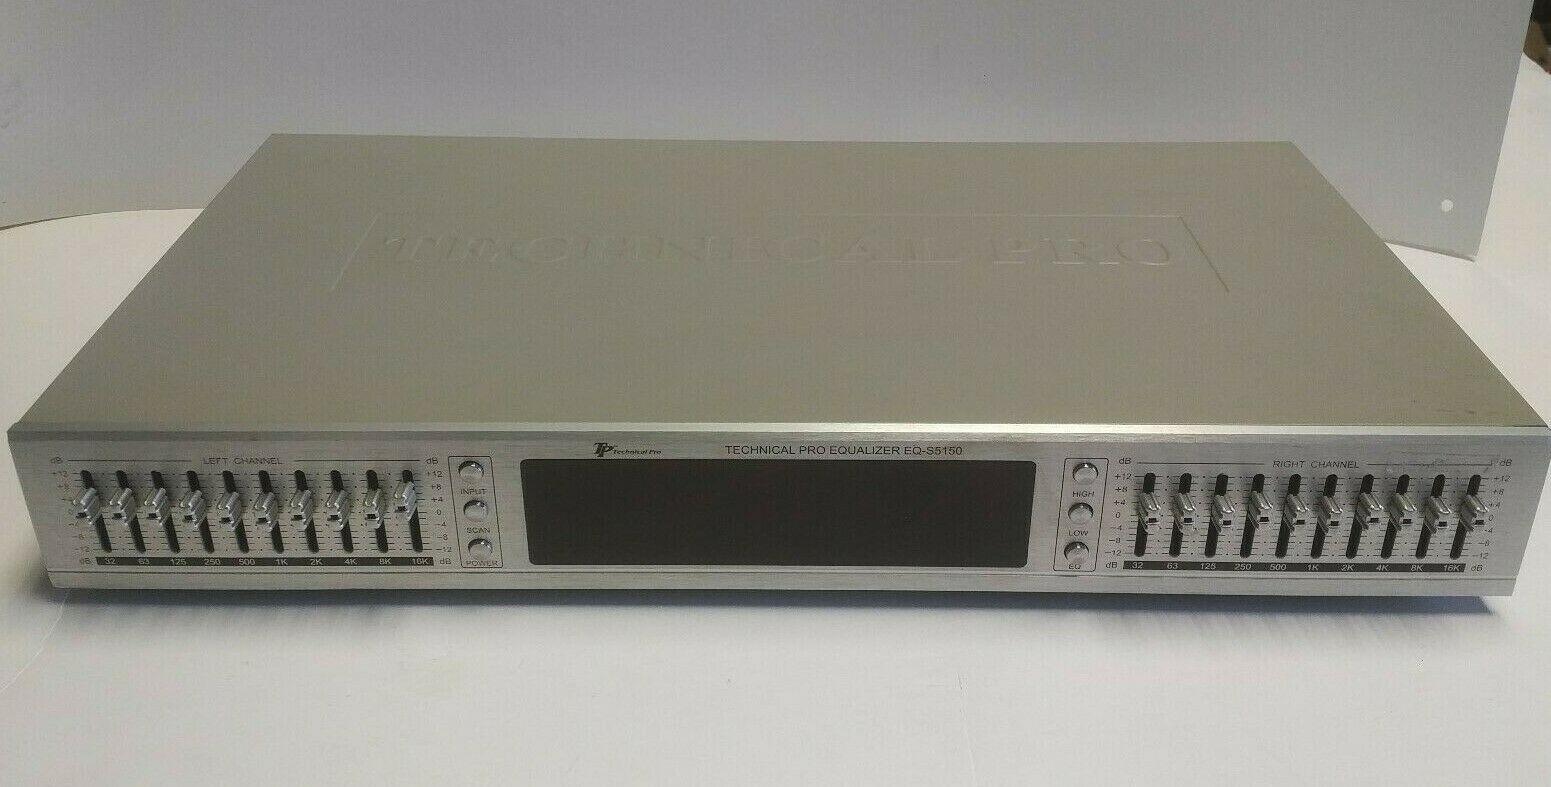 Technical Pro EQ-s5120 Digital Equalizer EQ